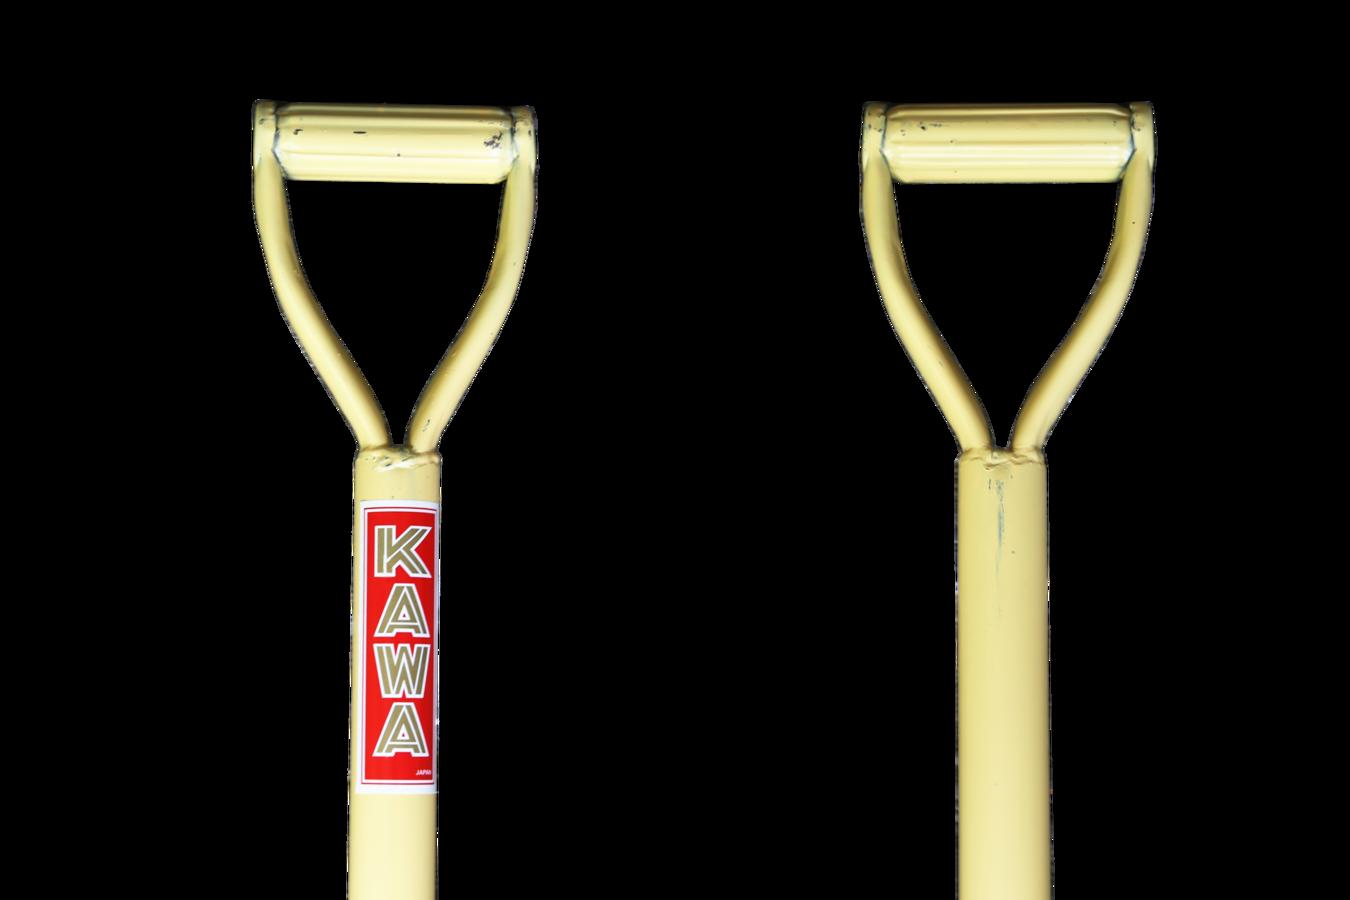 Original product027 image3